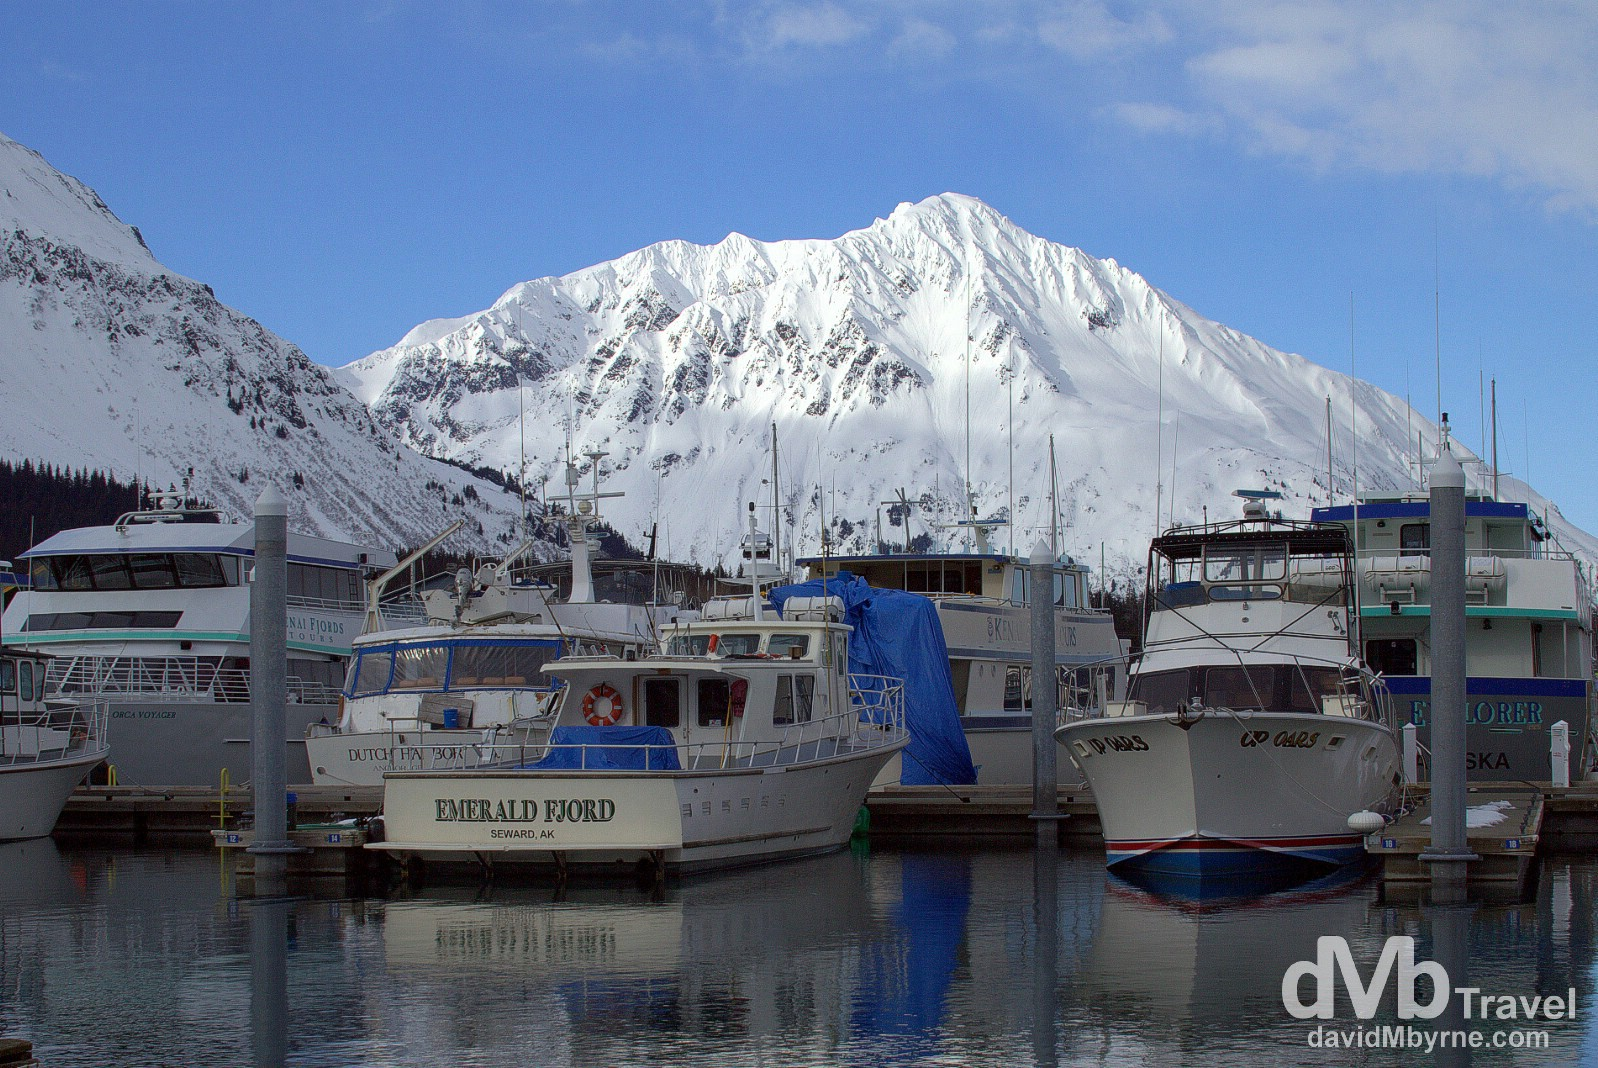 Boats in Seward Harbour, Seward, Kenai Peninsula, Alaska, USA. March 13th 2013.